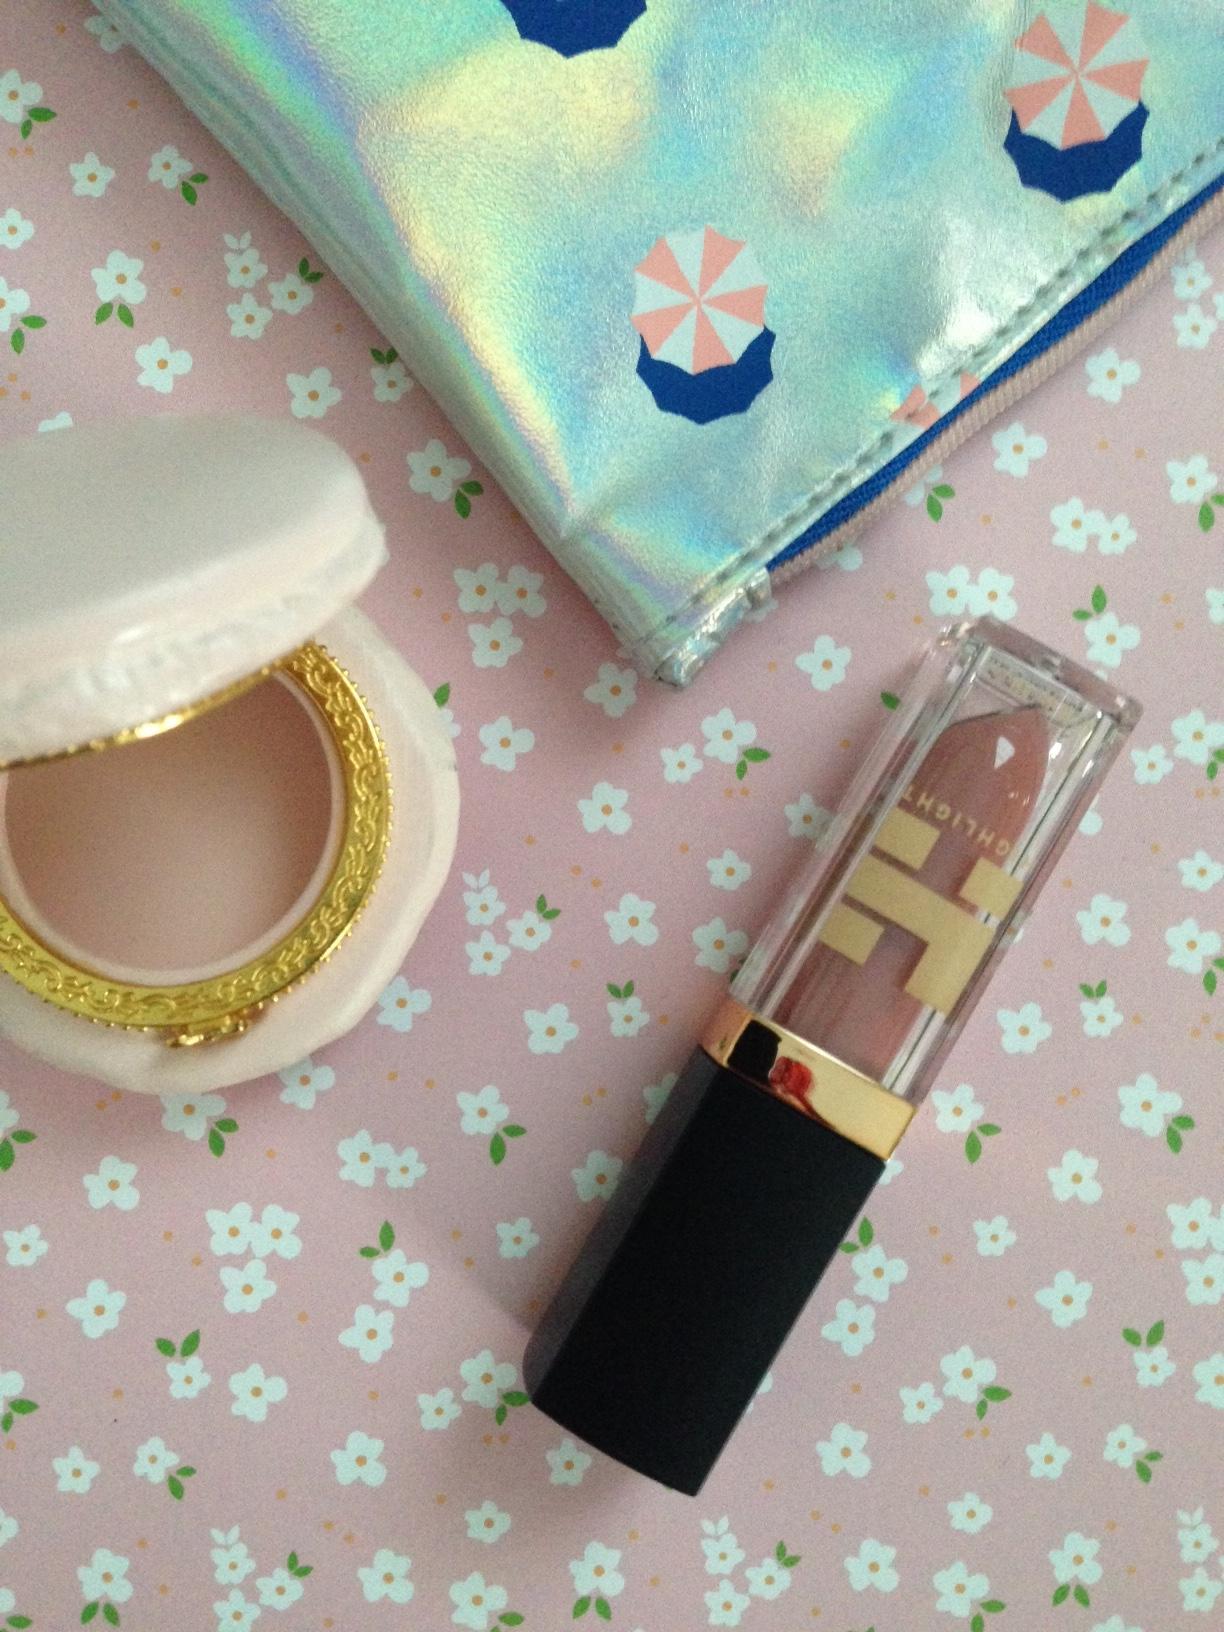 Highlight Liquid Lipstick Moroccan Spice tube neversaydiebeauty.com